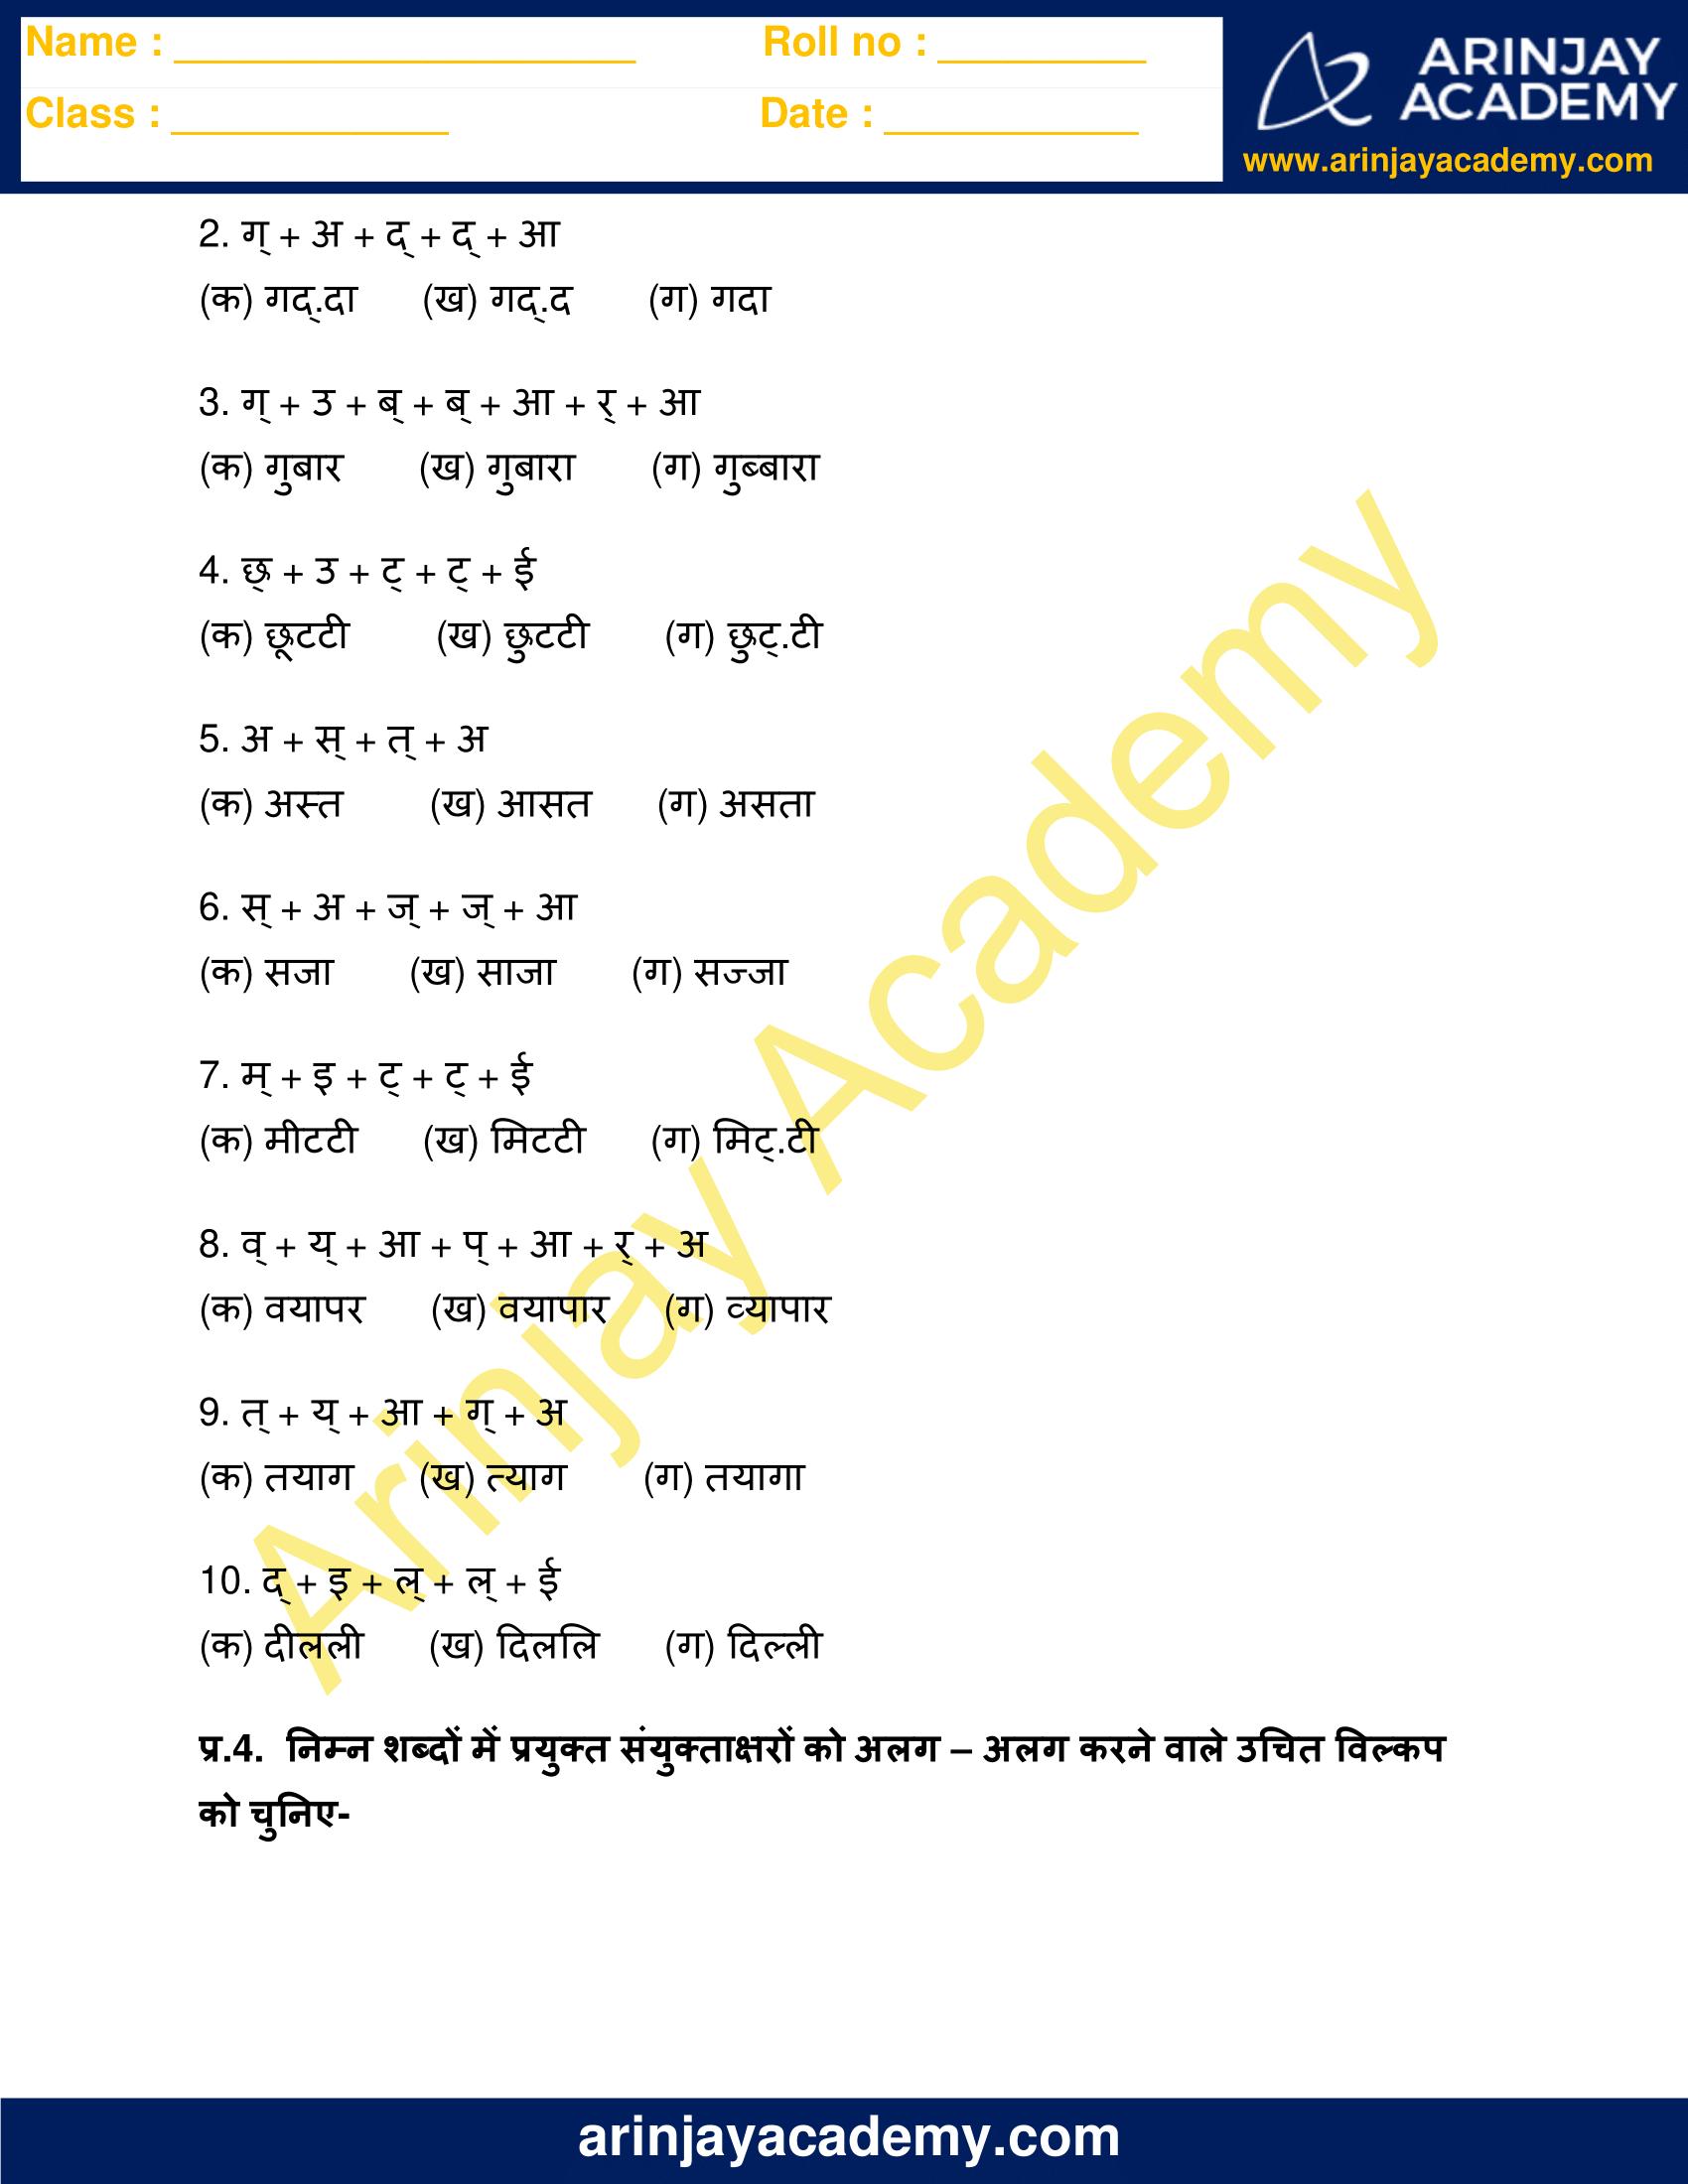 Sanyukt Vyanjan Worksheet for Class 3 image 4